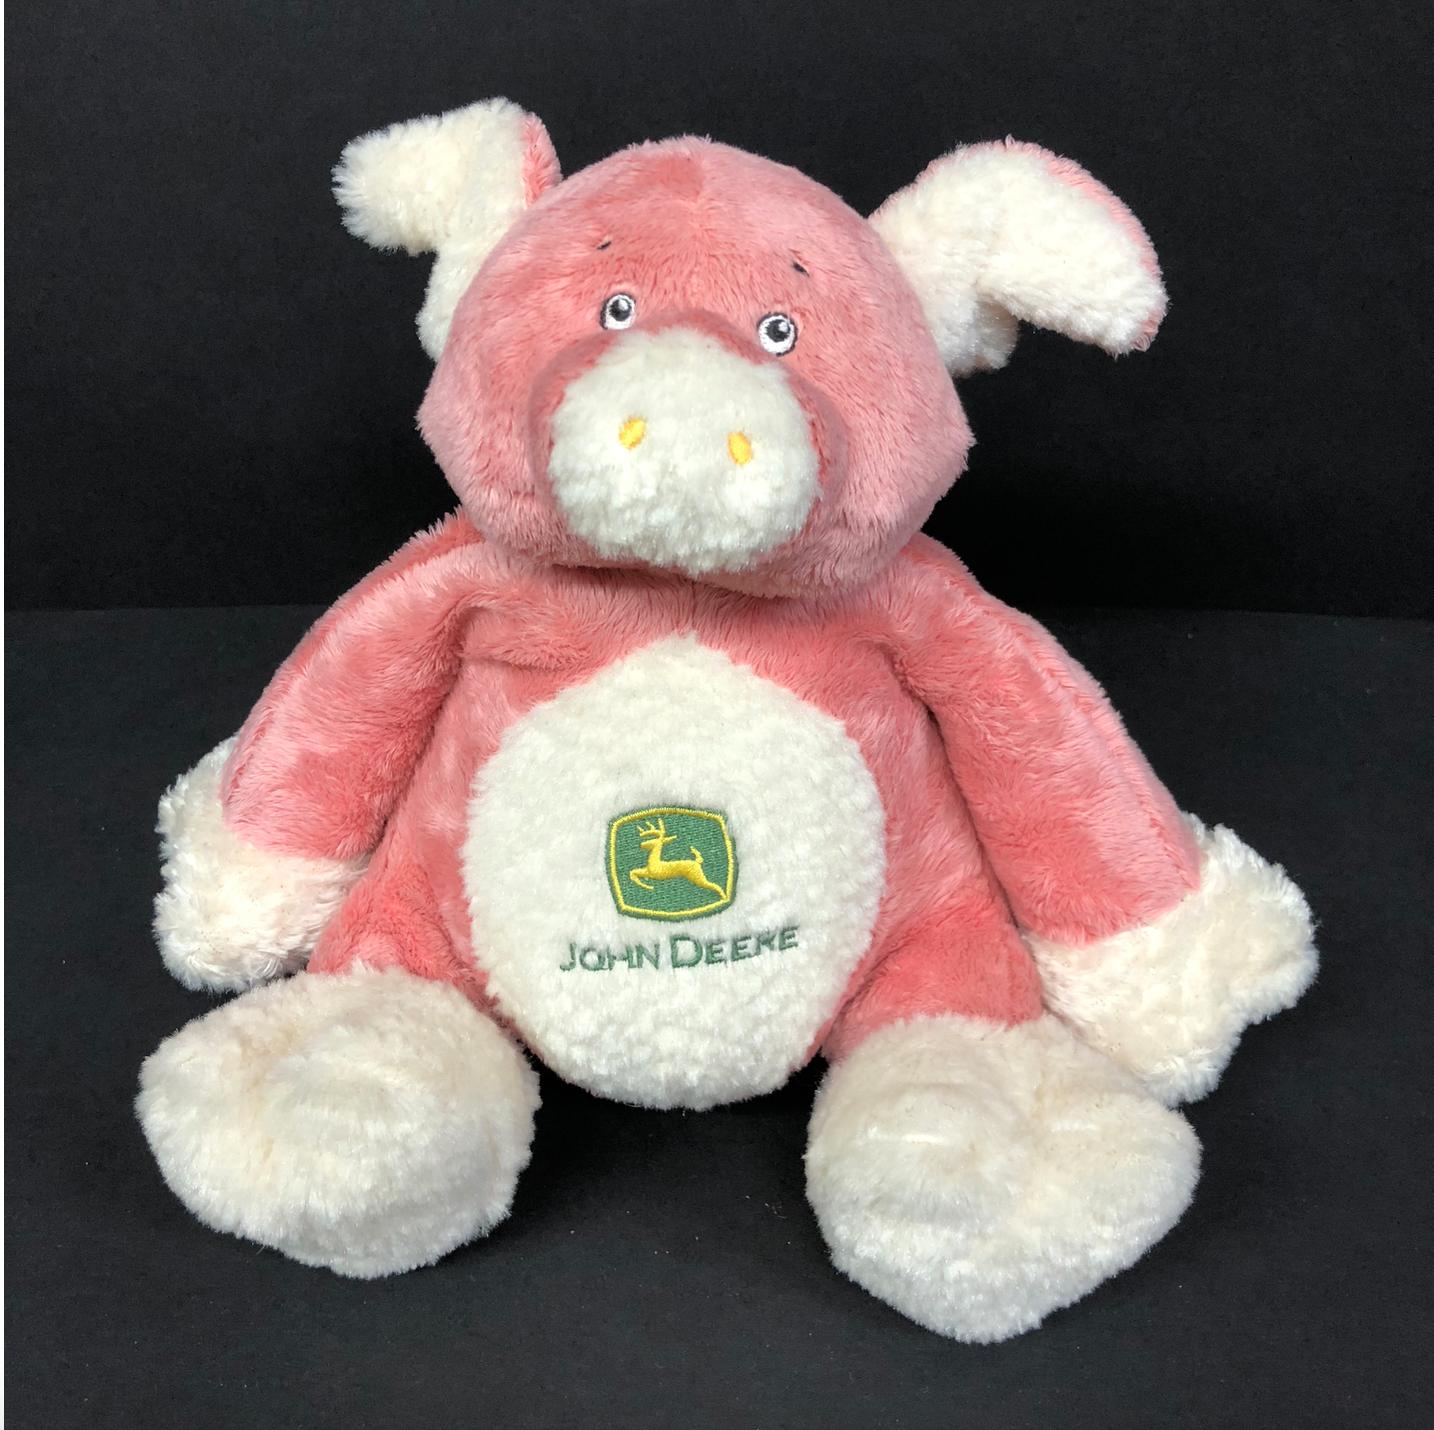 John Deere Rosa Plush Musical Pig Toy Rare Lights Up Sings